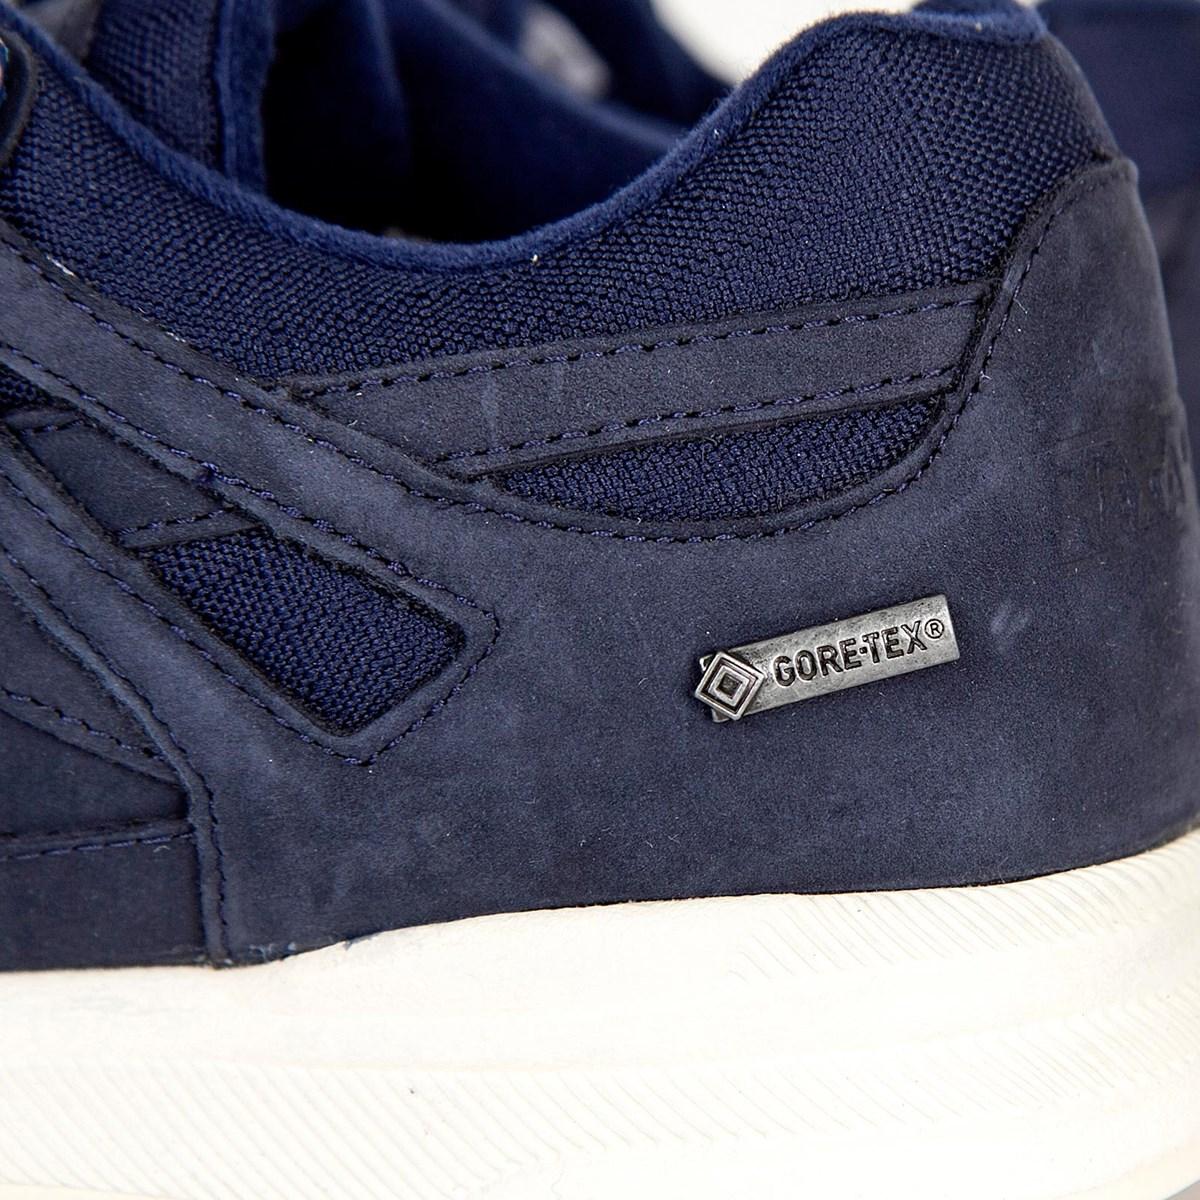 2c7ab3bd6882 Reebok Ventilator Goretex - V66308 - Sneakersnstuff